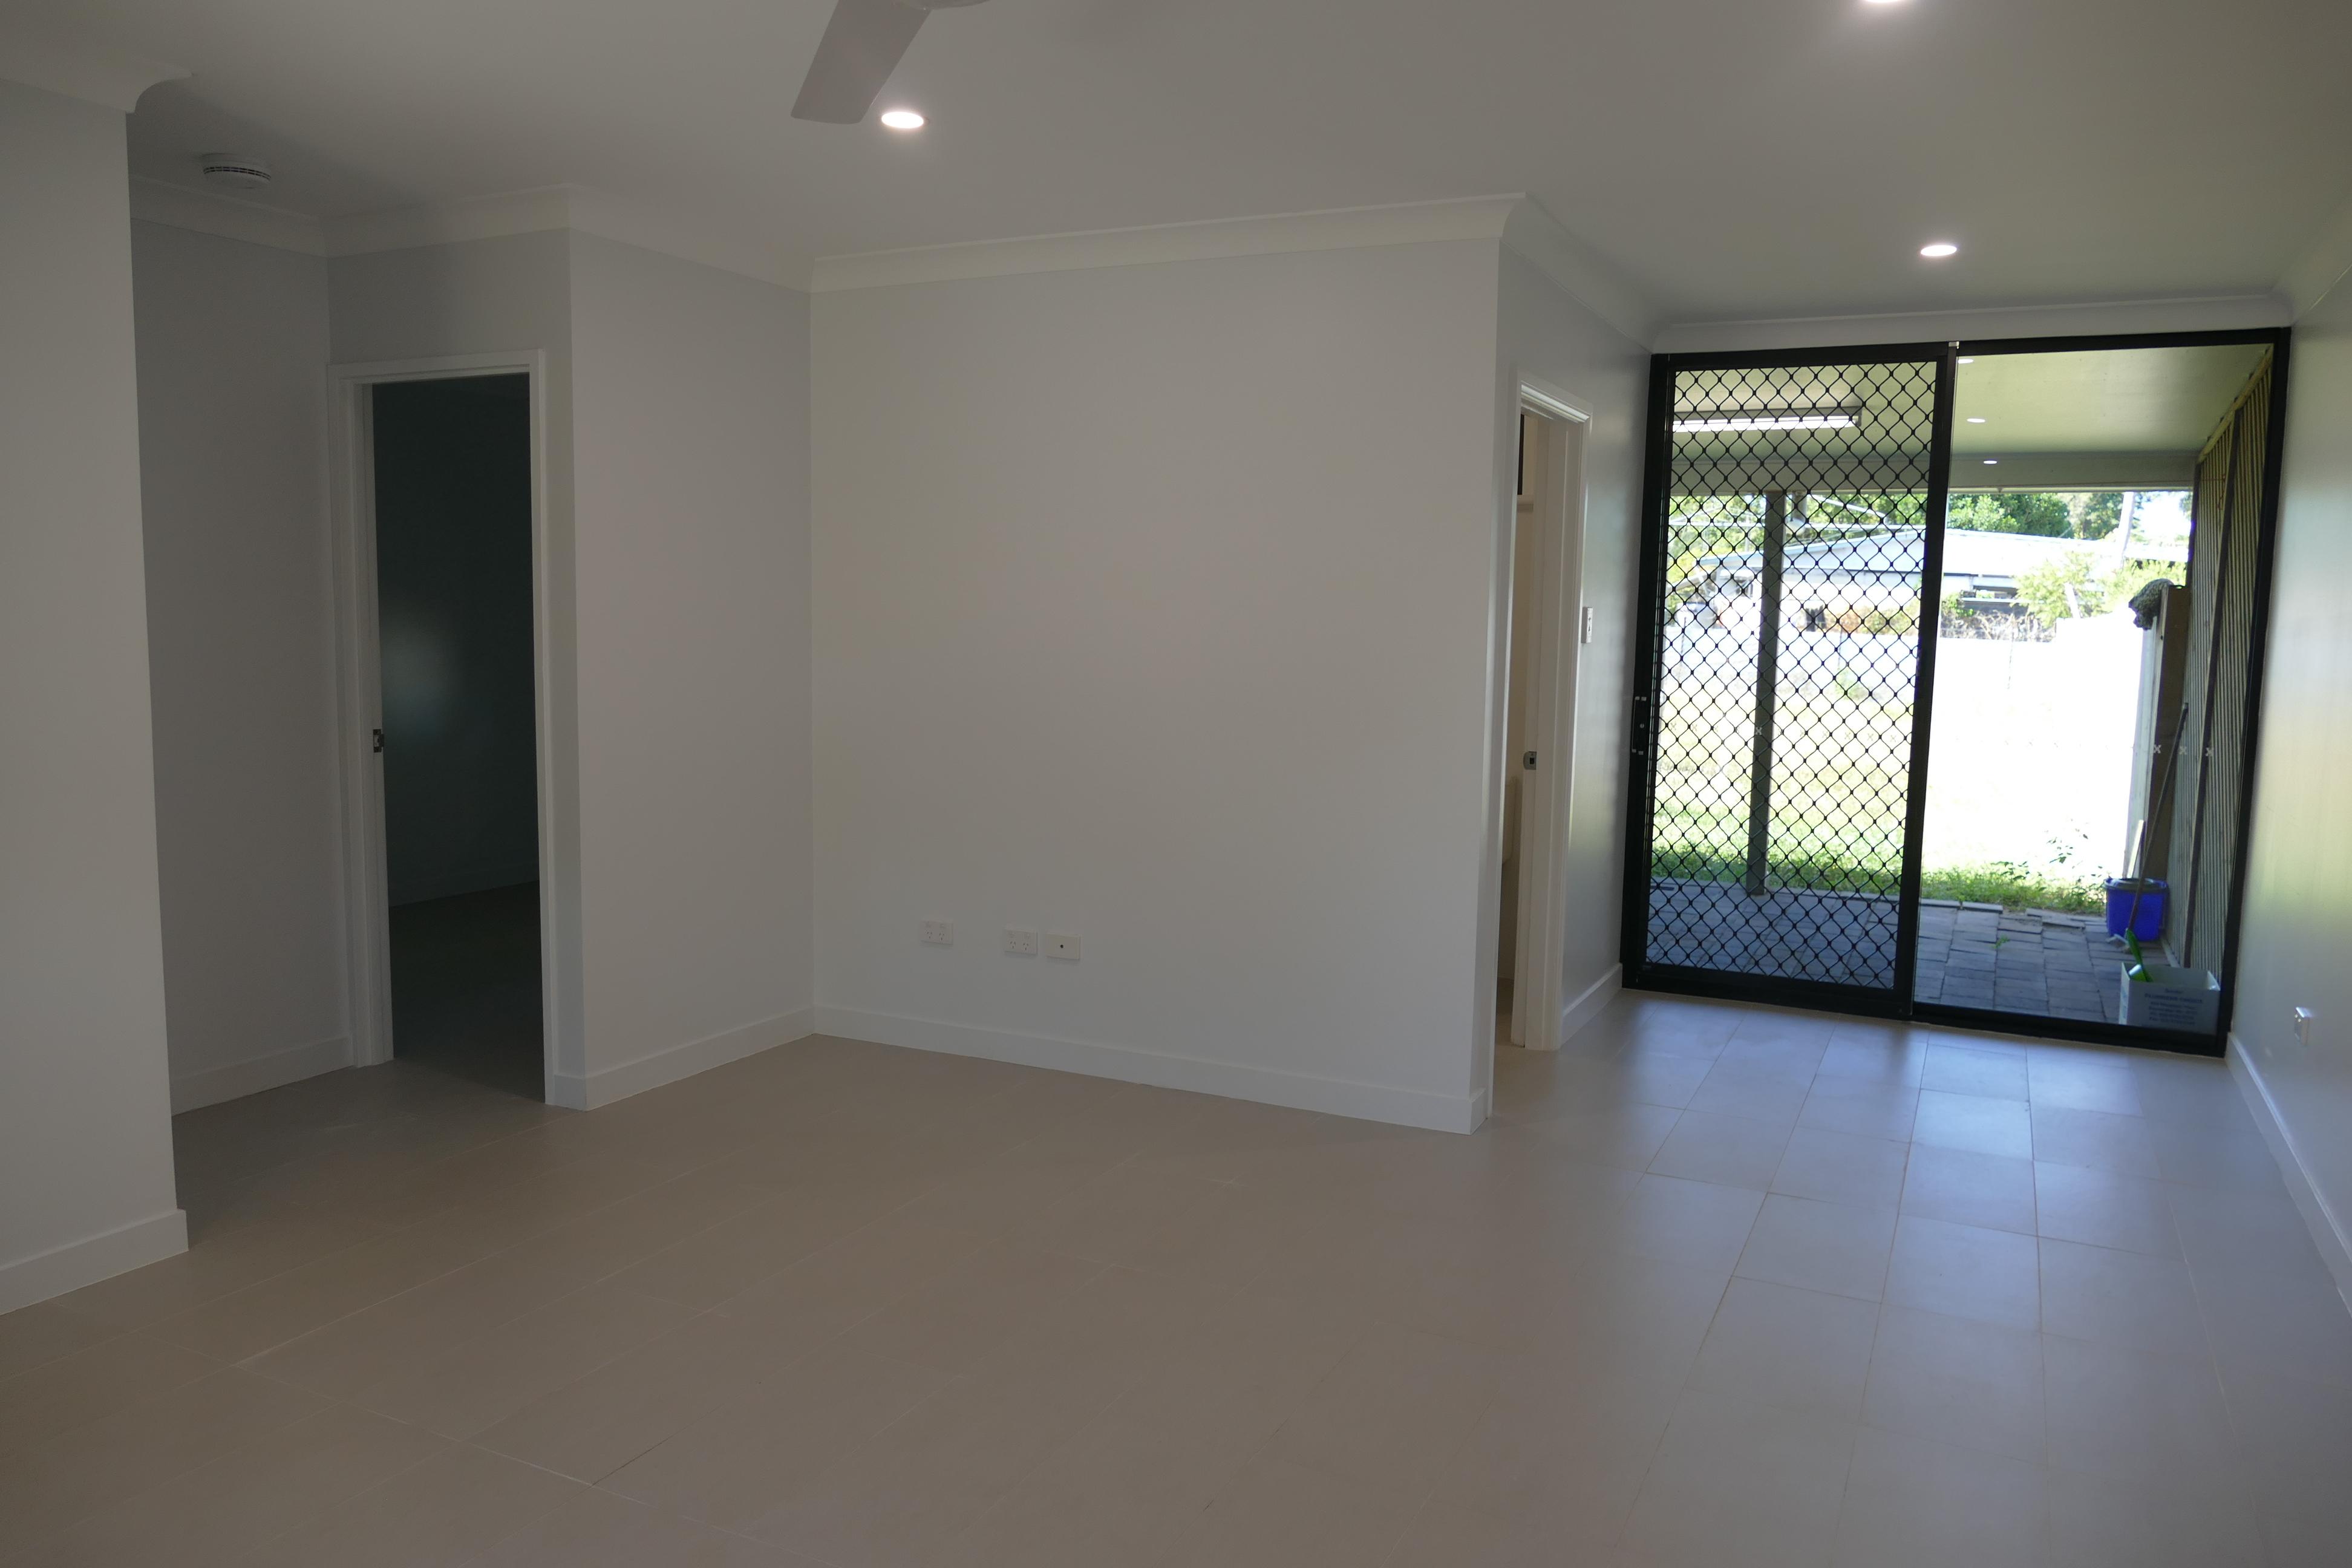 Hinchinbrook Real Estate Unfurnished Unit Two Bedroom